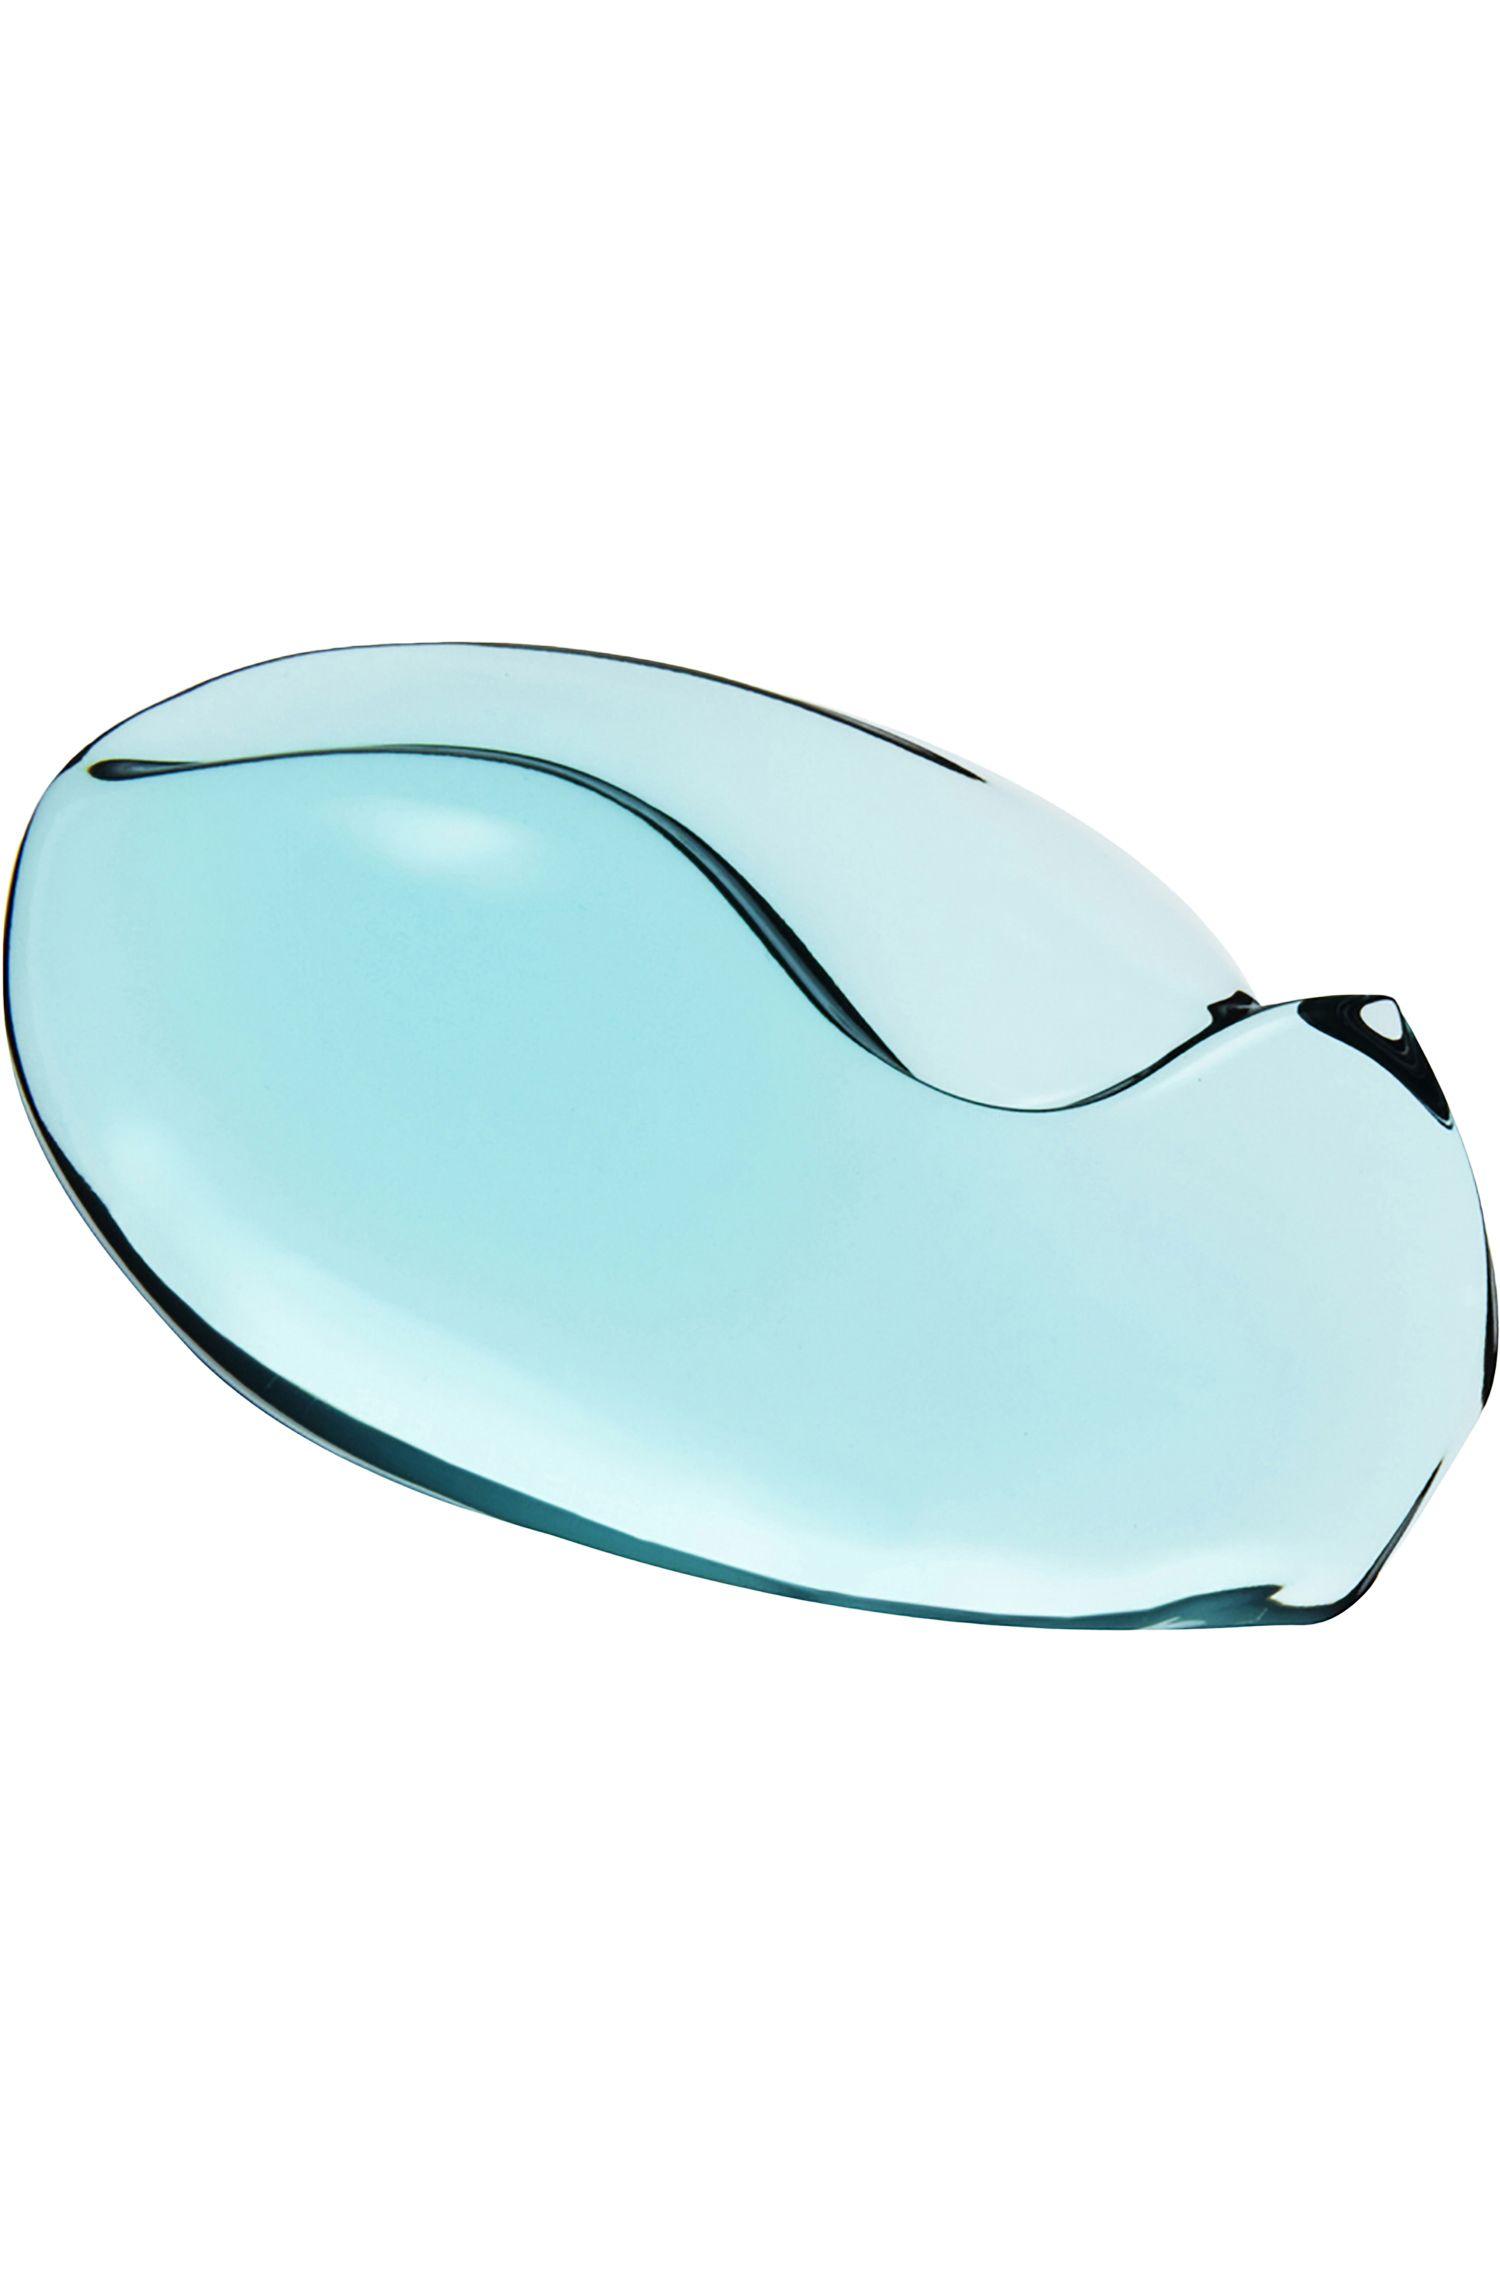 Blissim : Clarins - Gel anti-cernes contour des yeux - Gel anti-cernes contour des yeux